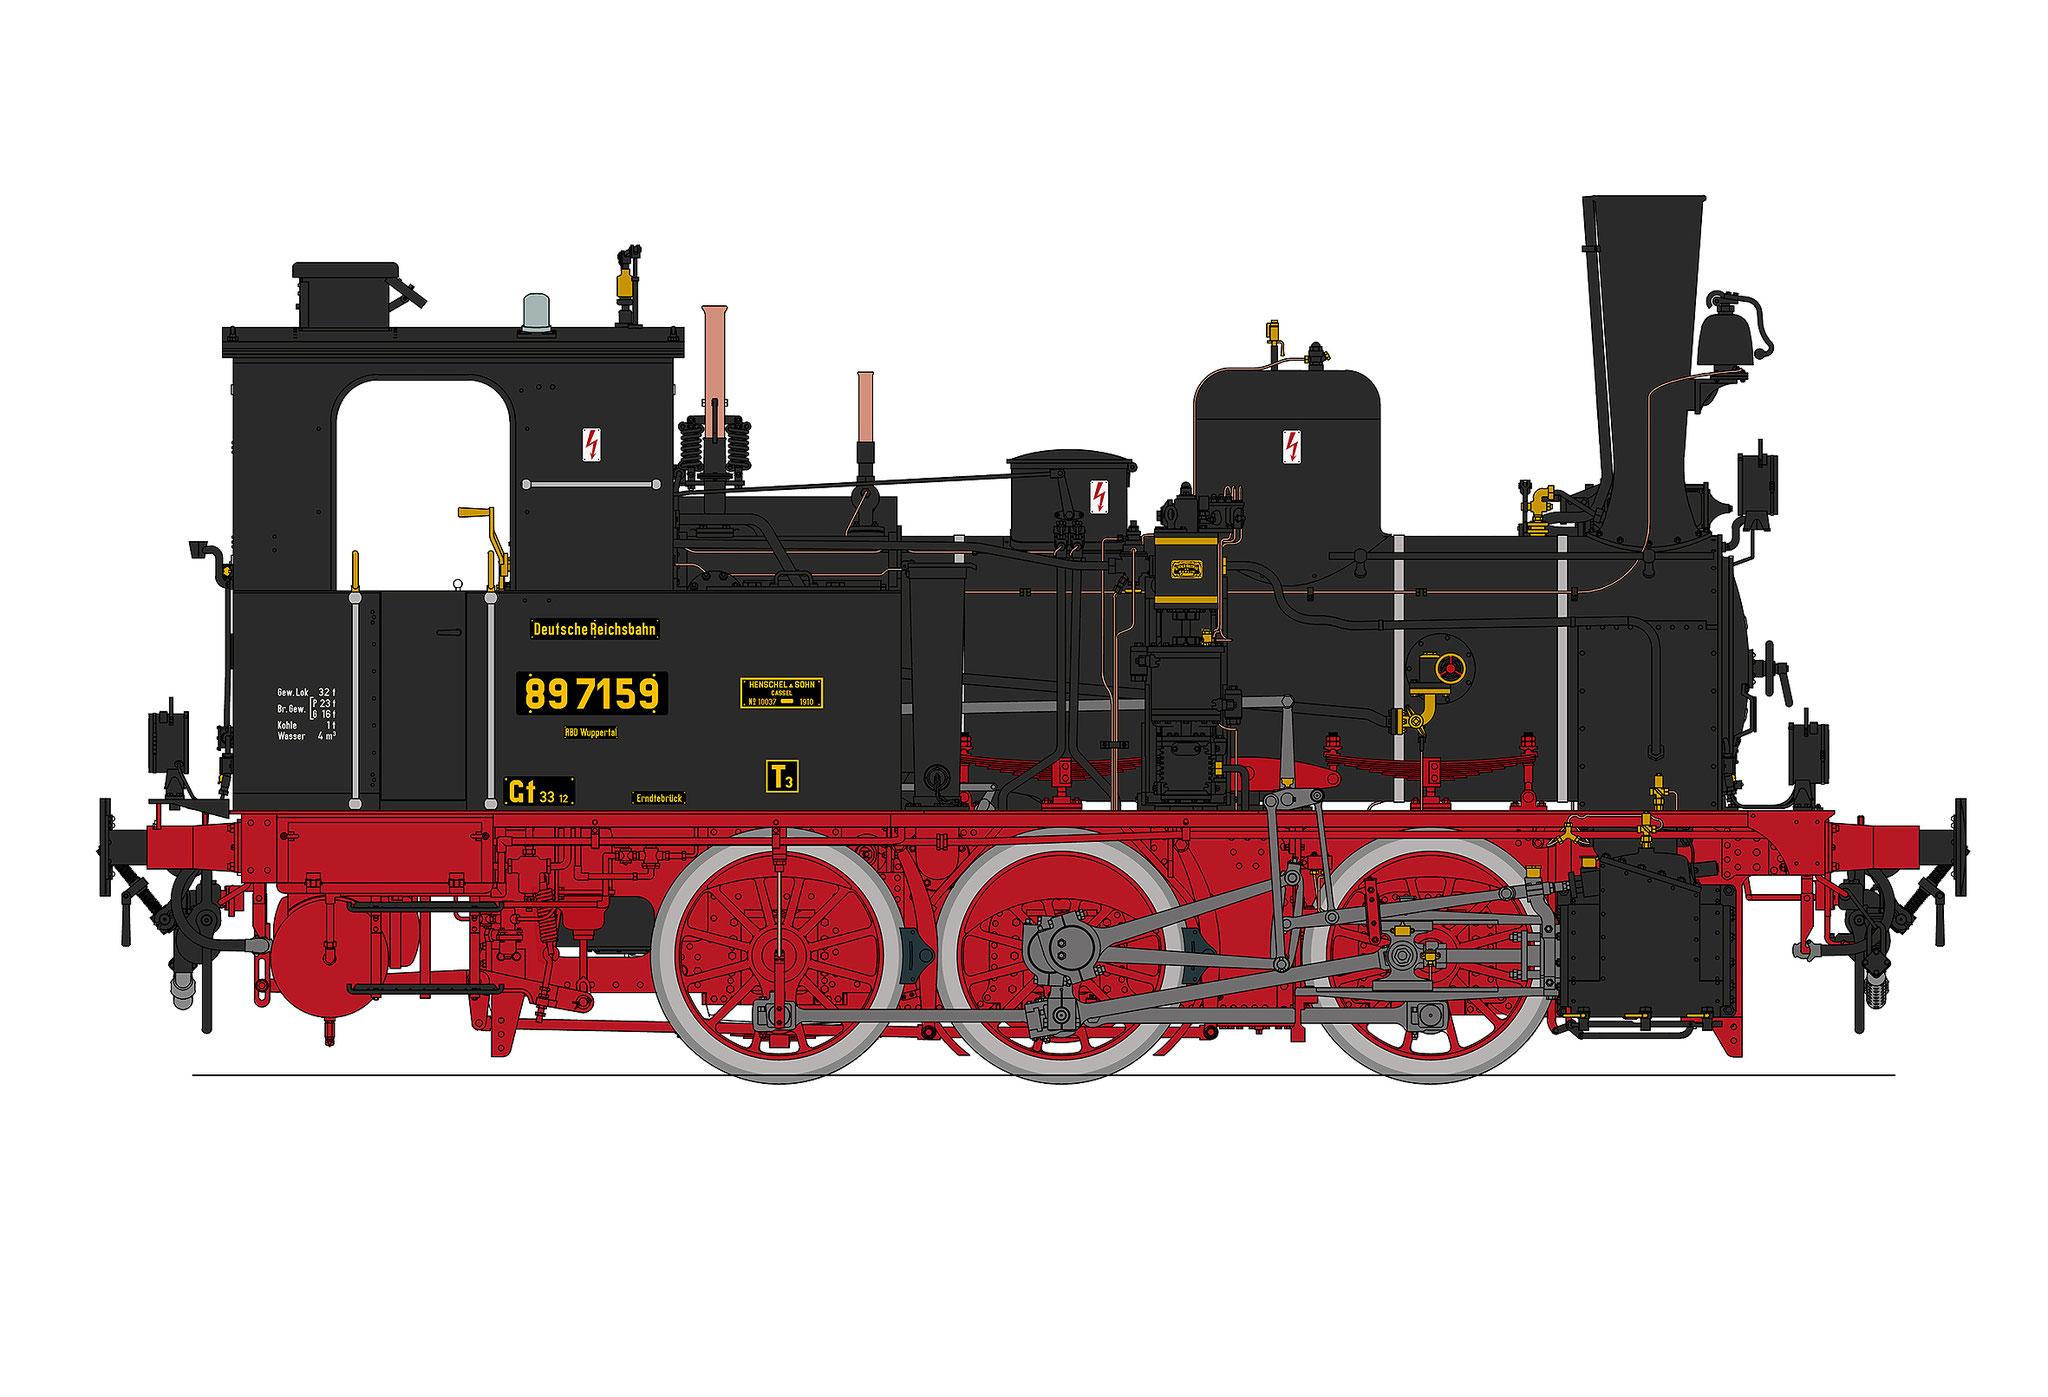 Bestell-Nr. 11031 - Colorierung